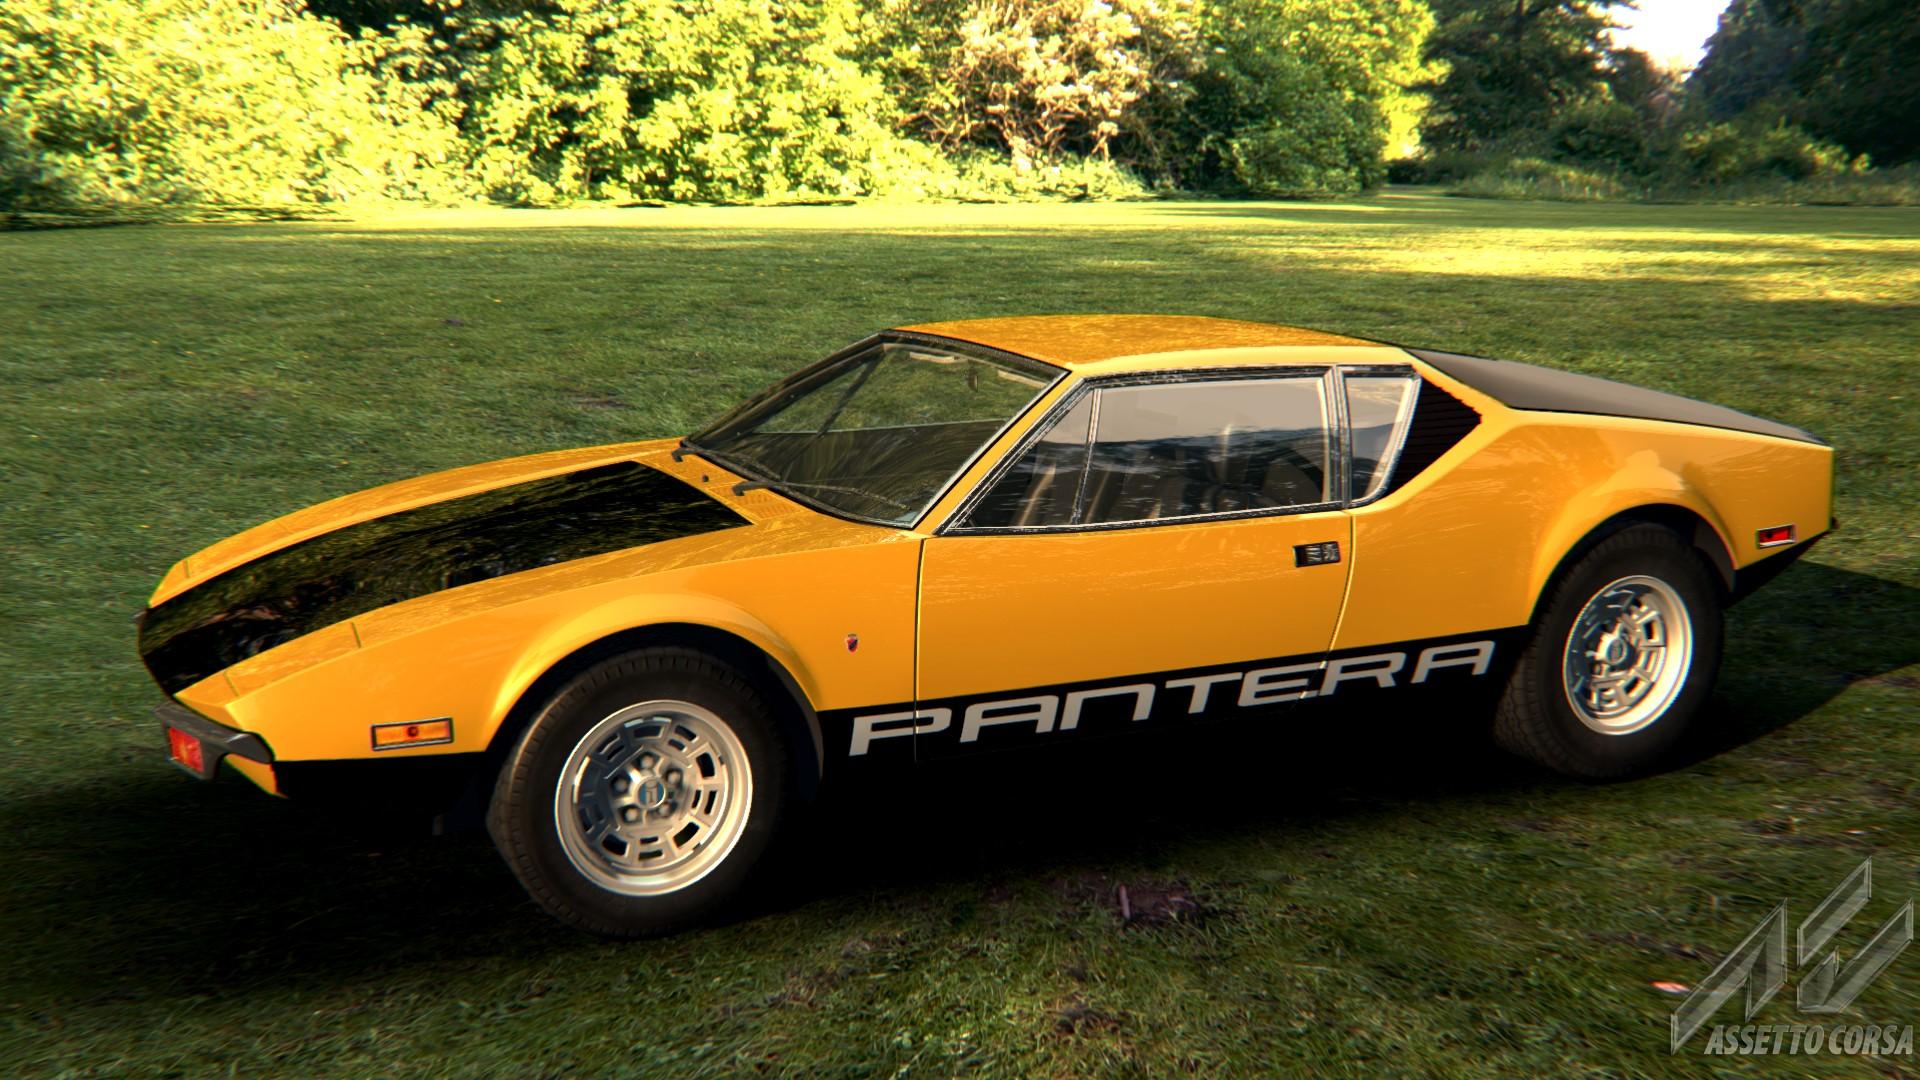 Muscle Cars List >> DeTomaso - Pantera - Car Detail - Assetto Corsa Database